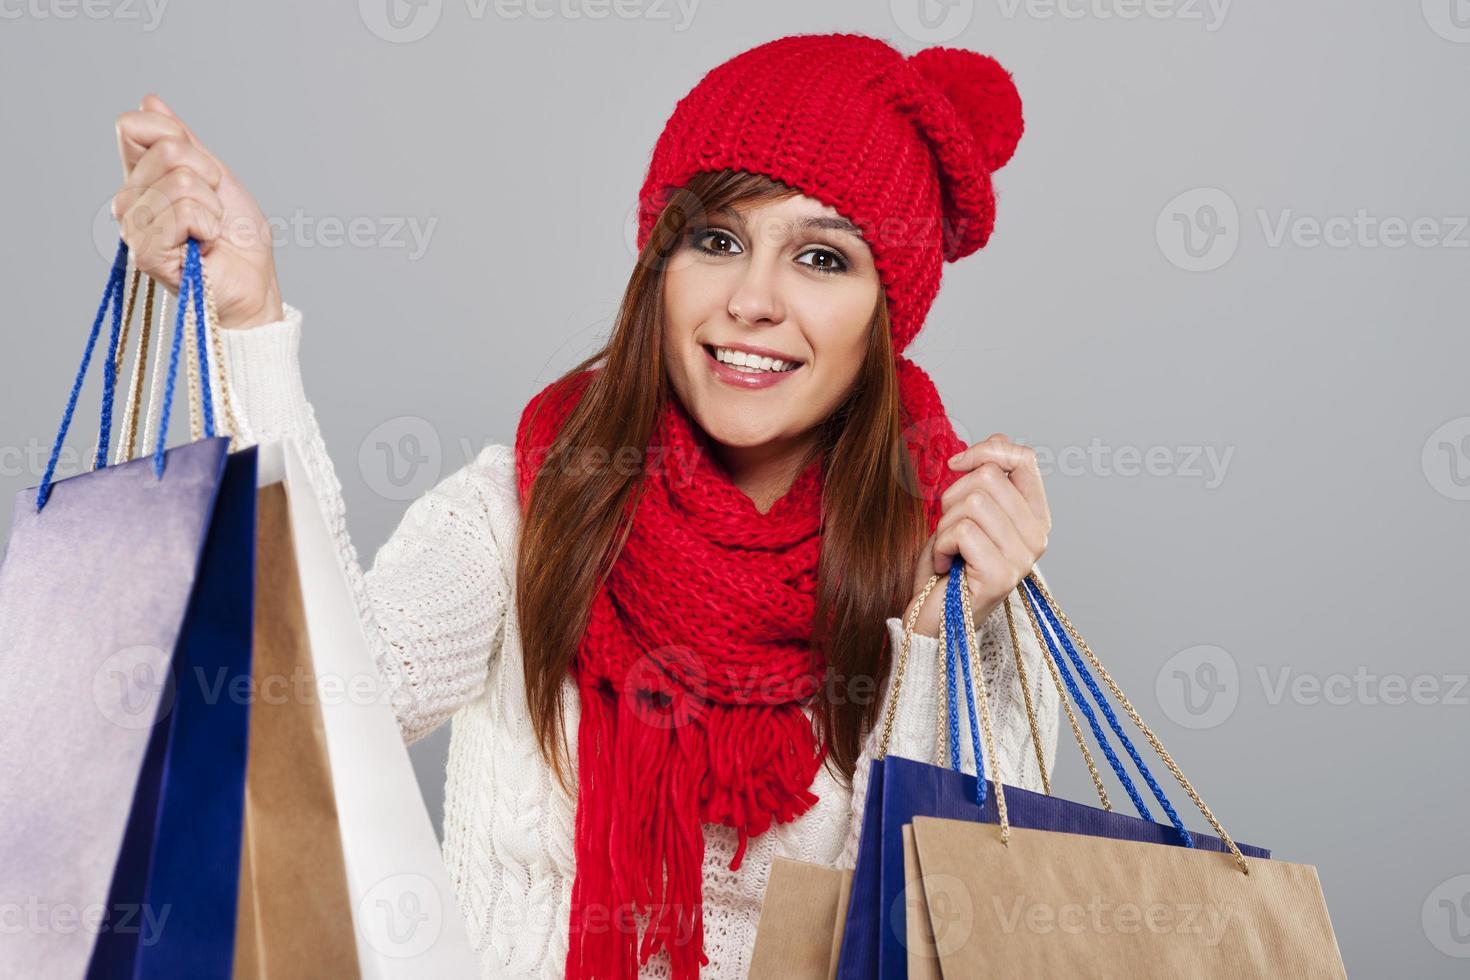 allegro shopacholic durante i saldi invernali foto